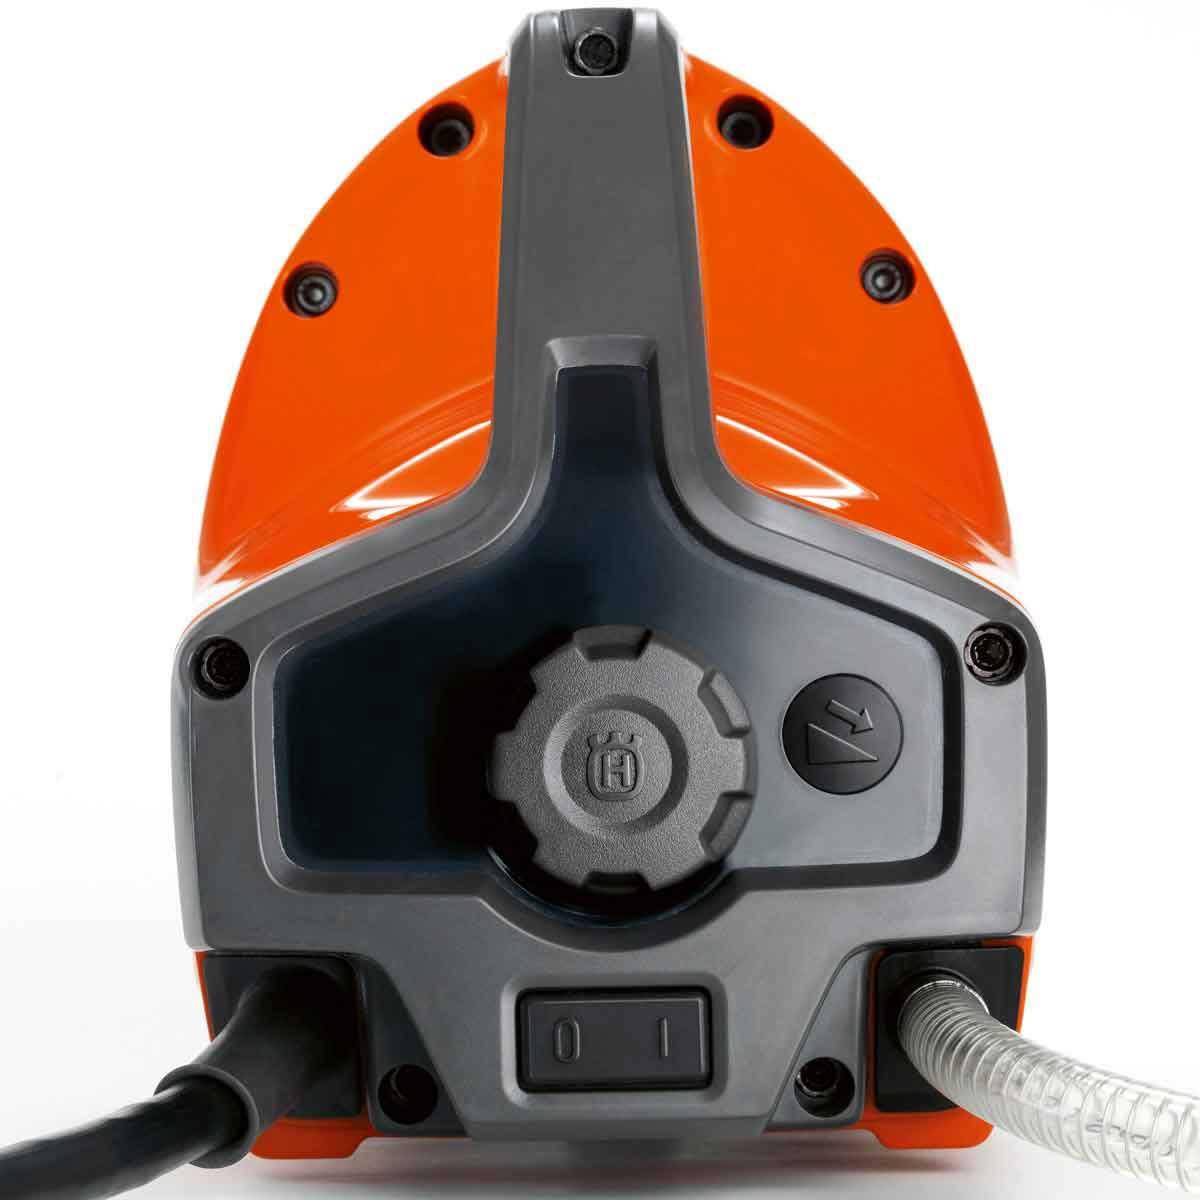 Husqvarna DM650 Motor Drill switch